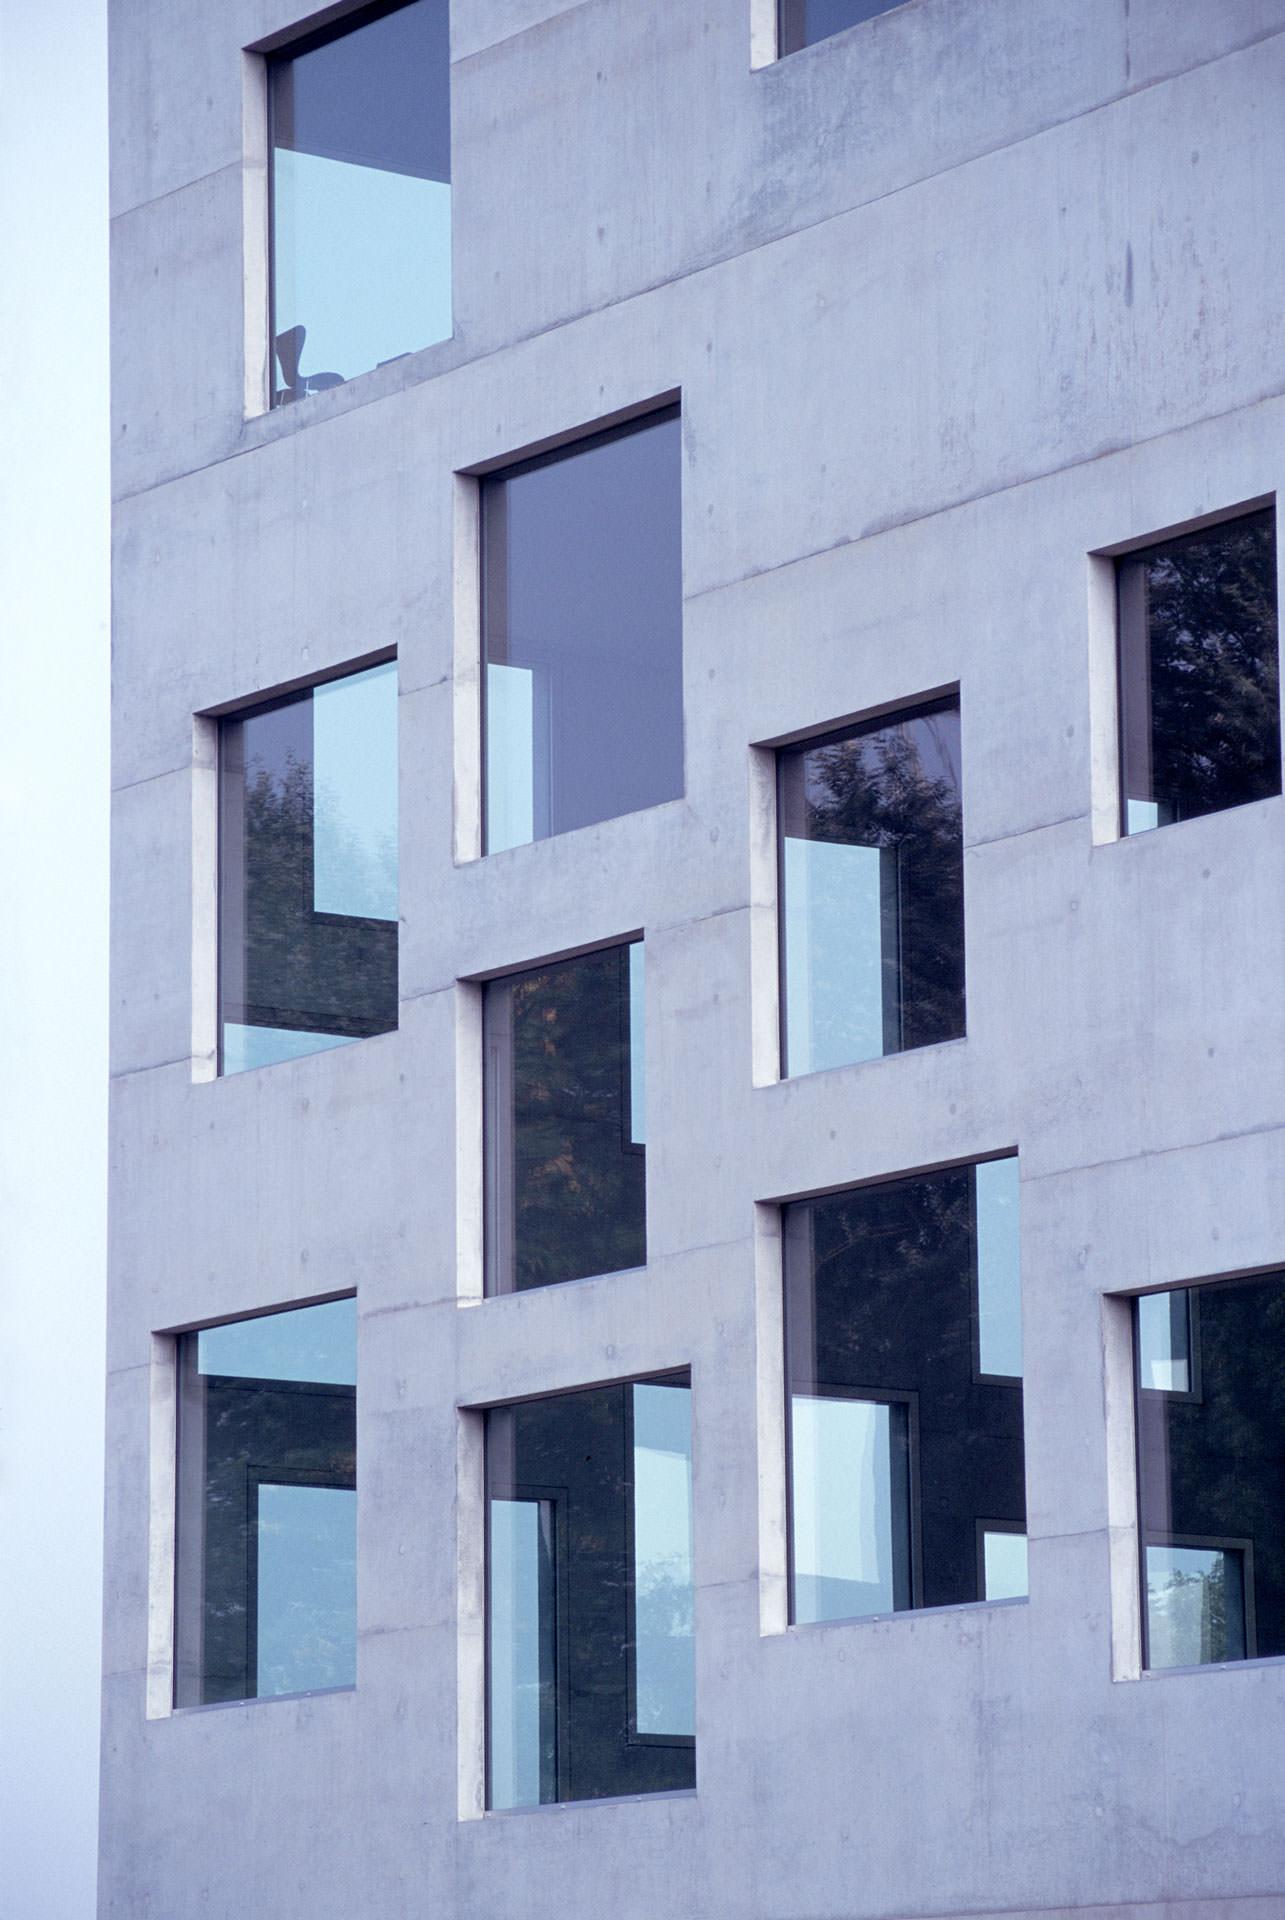 Zollverein School of Management and Design